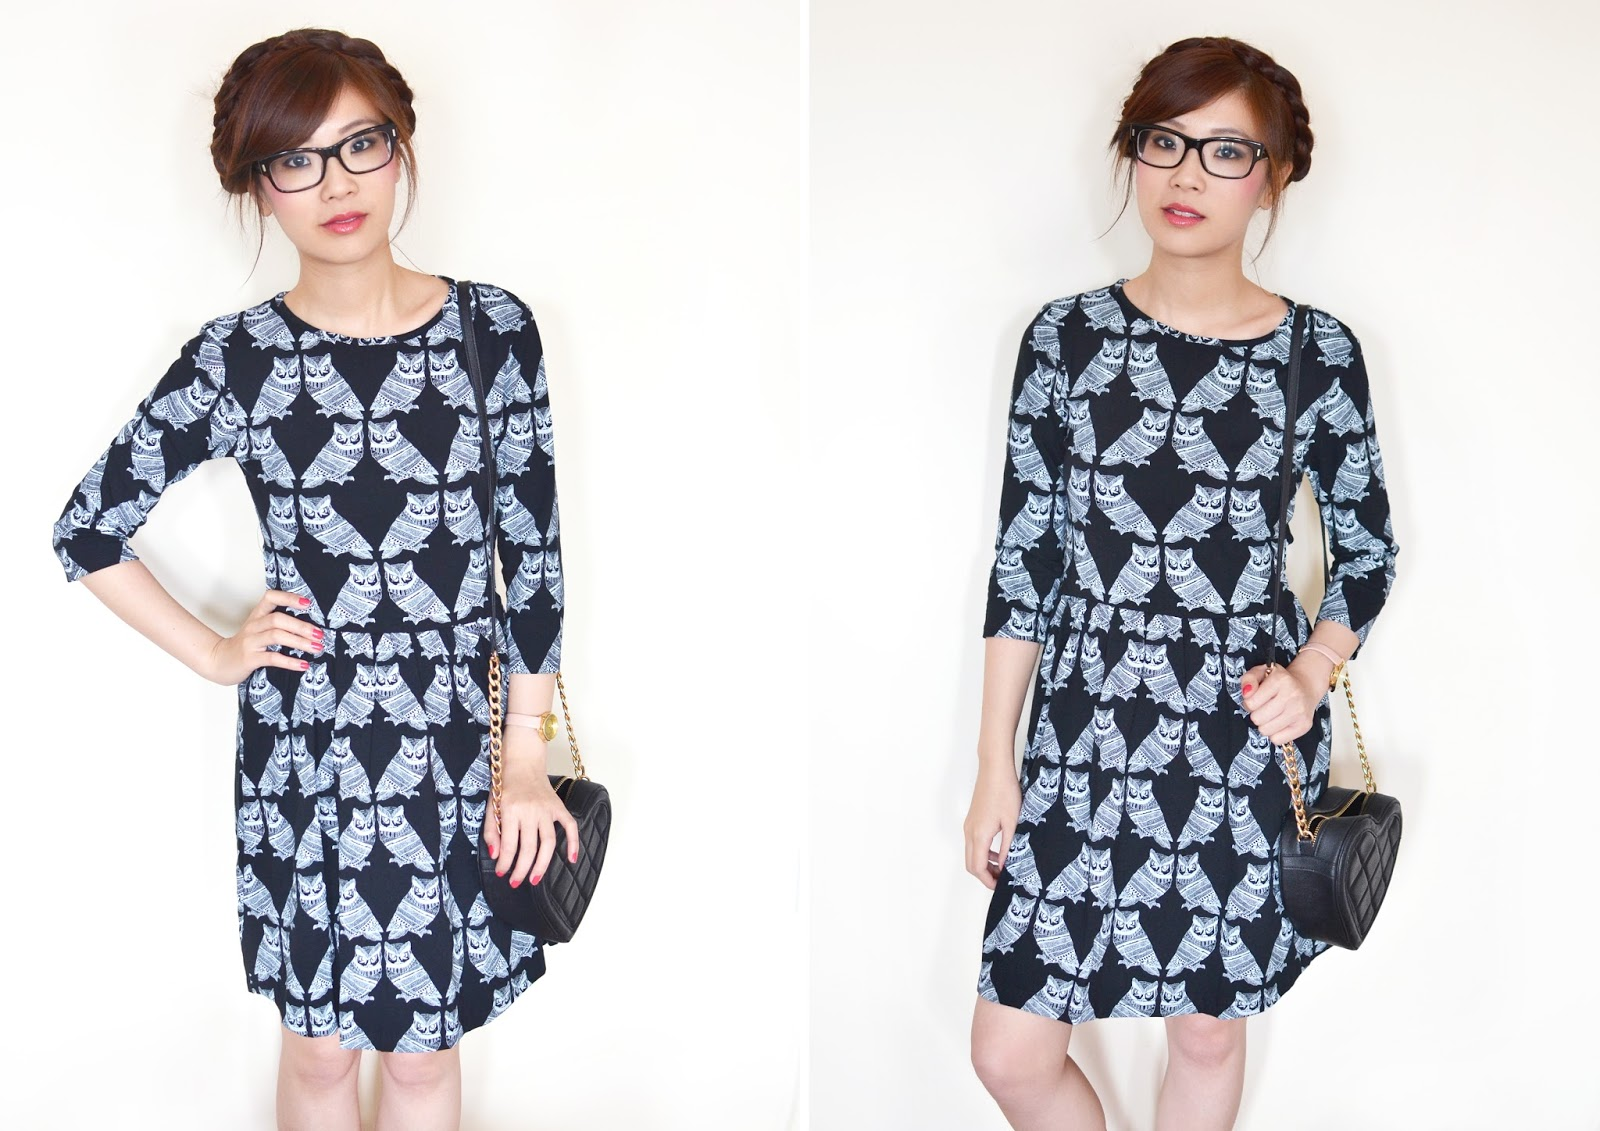 owl print dress, skater dress, how to style a black skater dress